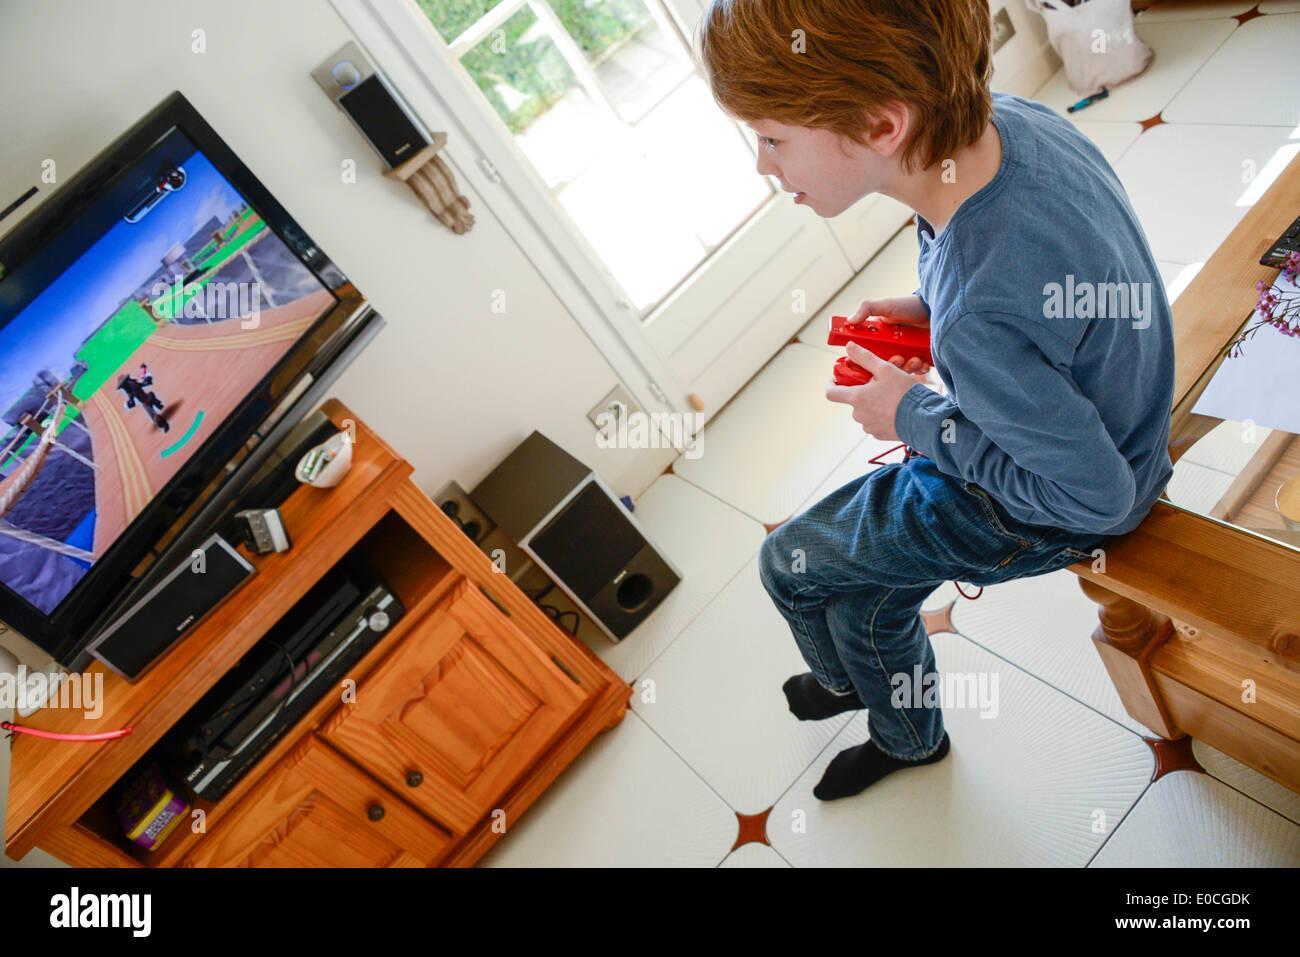 Enfant jouant avec jeu vidéo Photo Stock